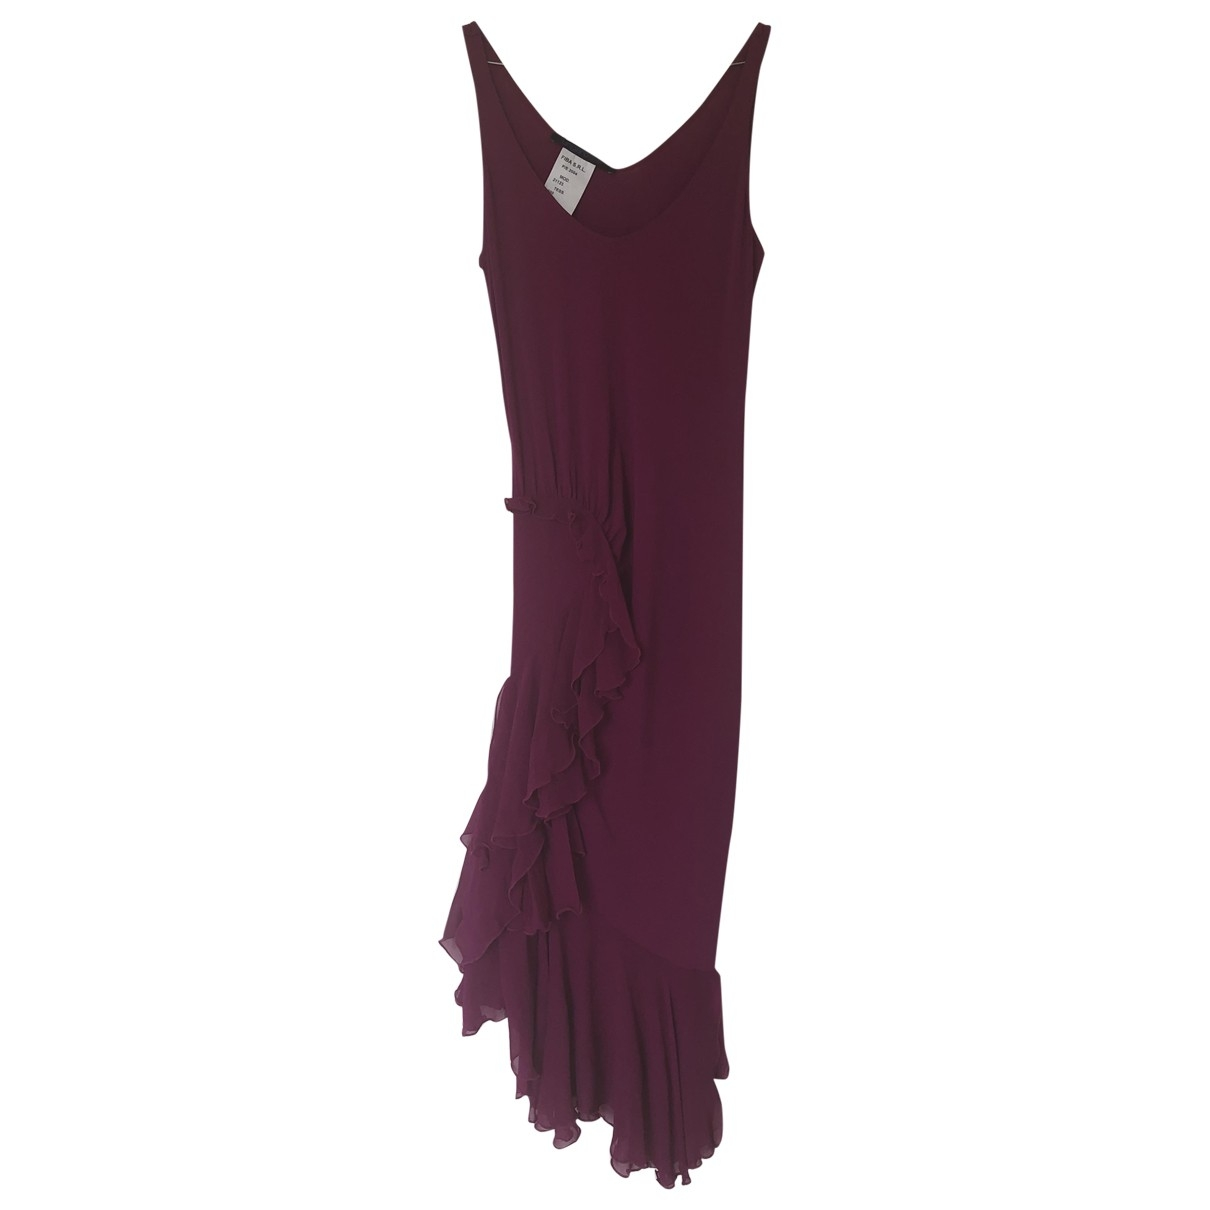 Emanuel Ungaro \N Pink Silk dress for Women 36 FR